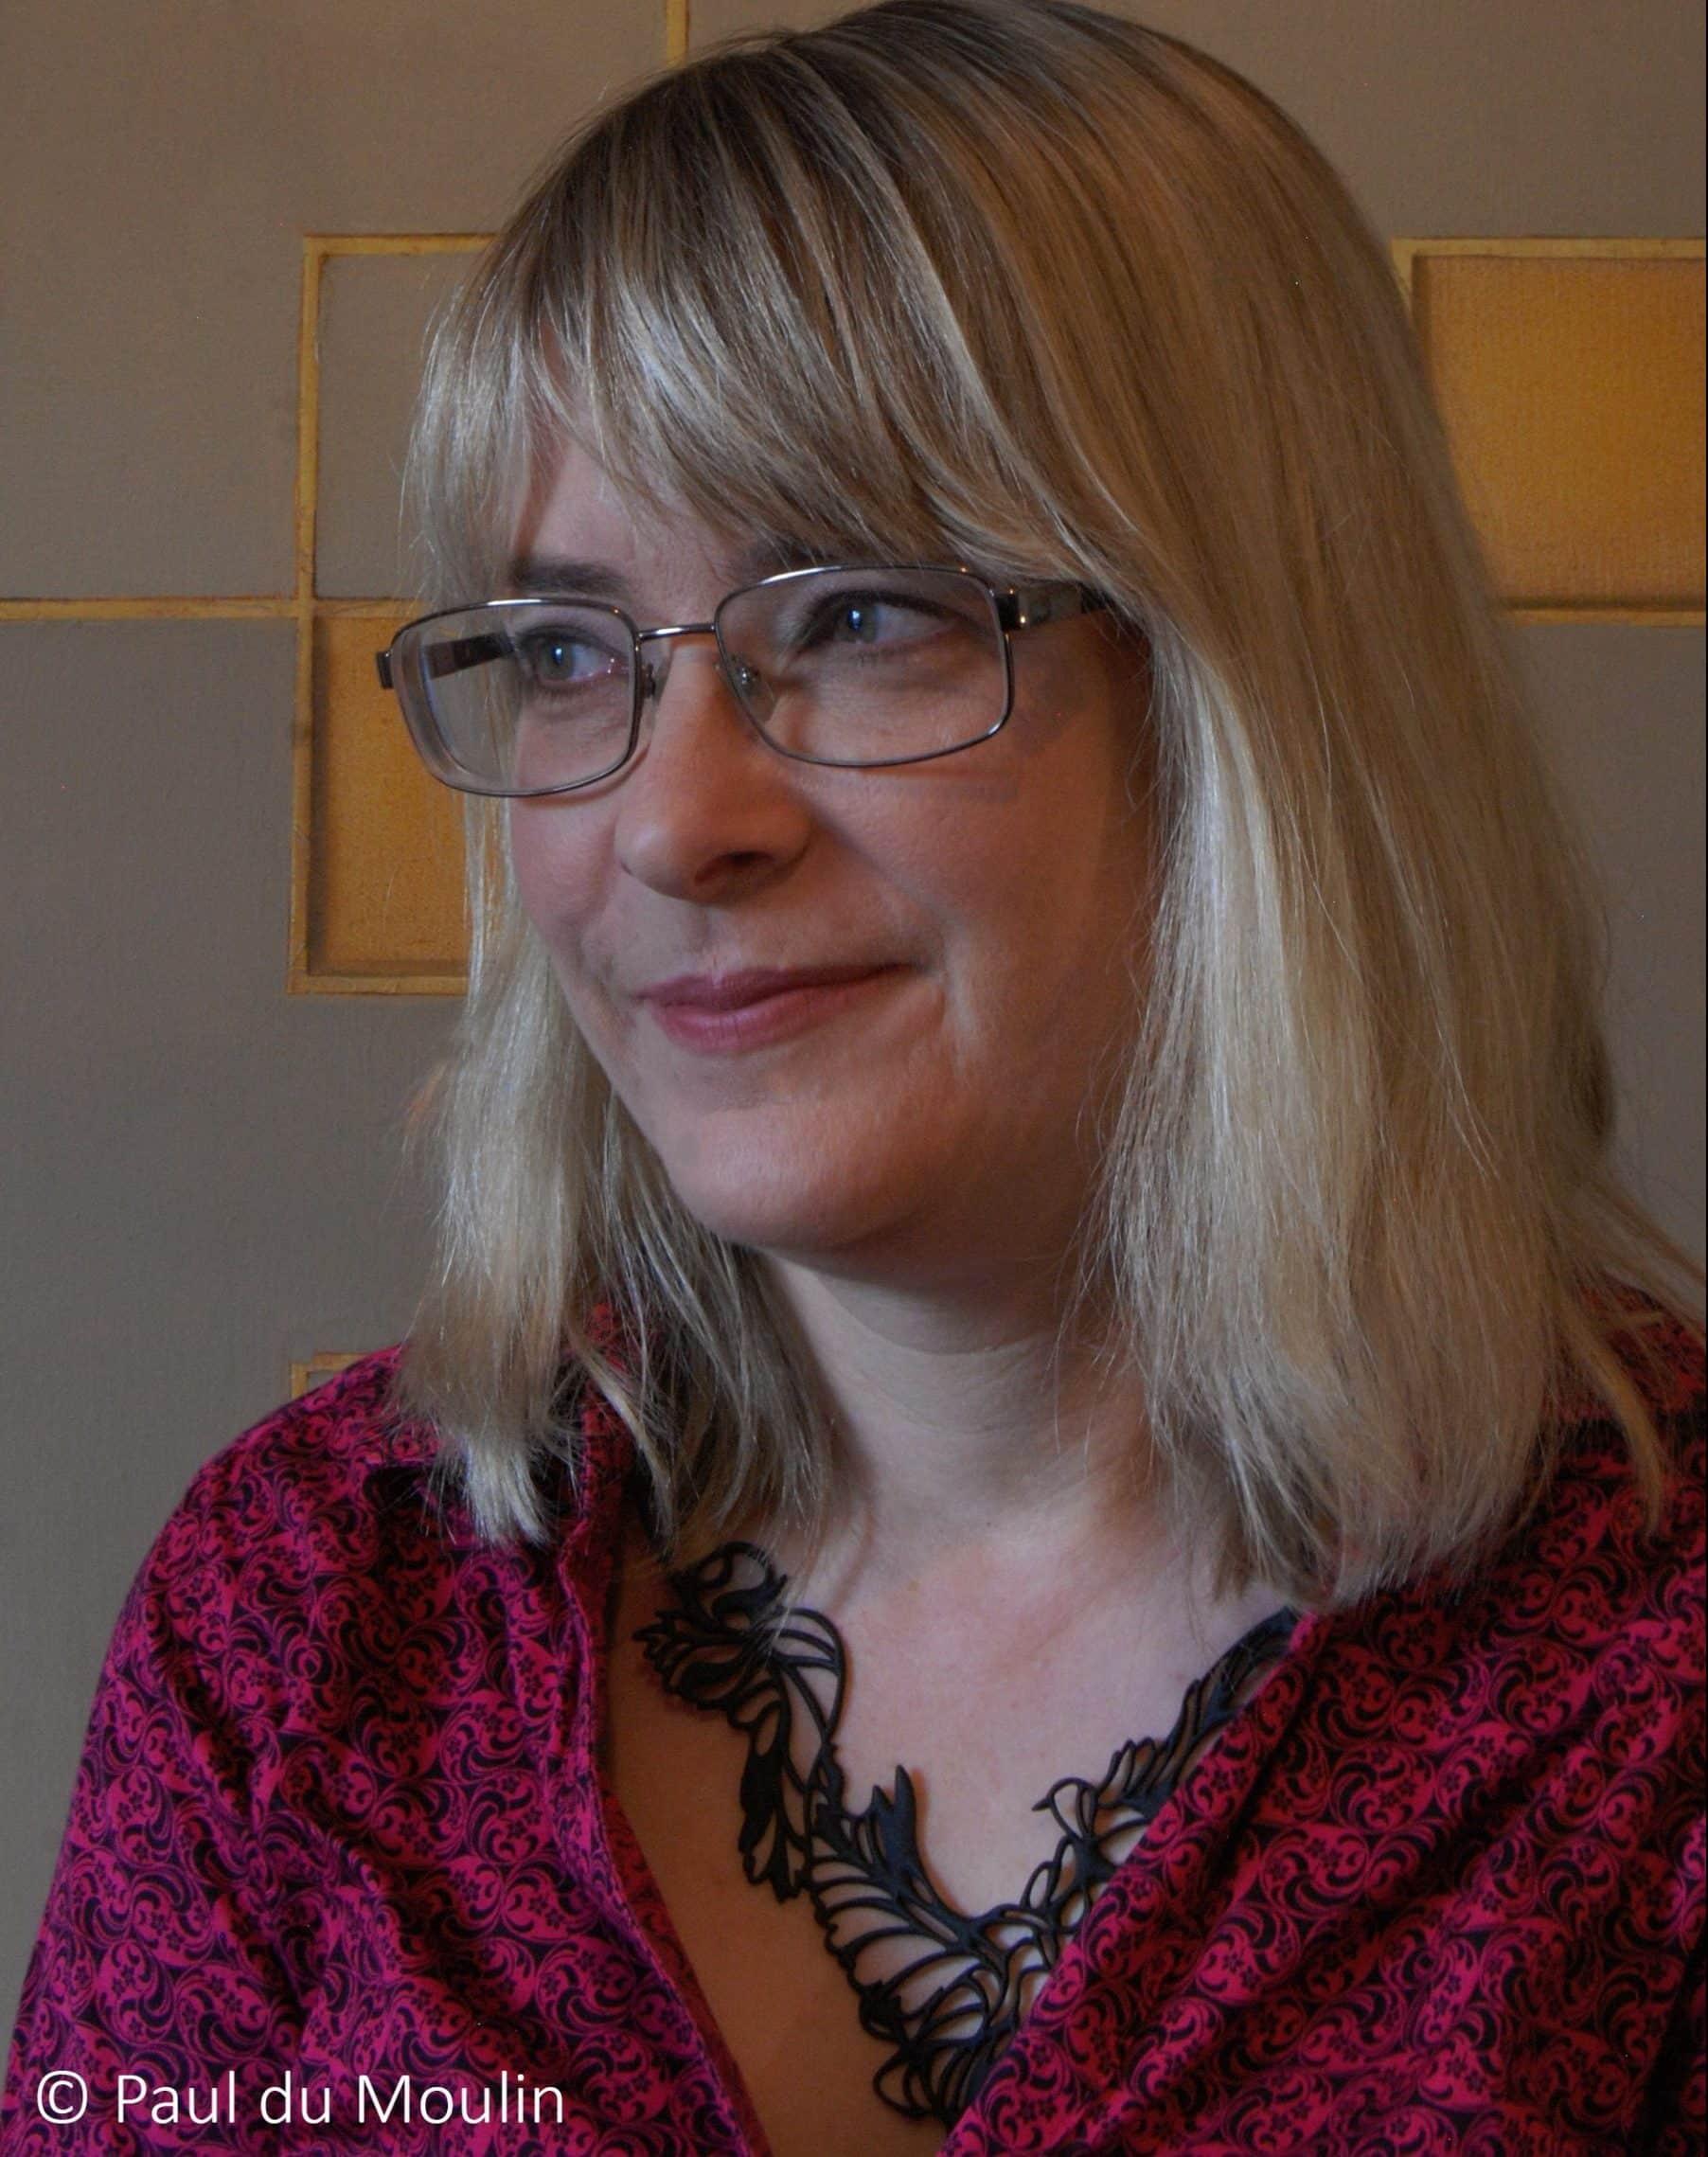 Catherine Jinks